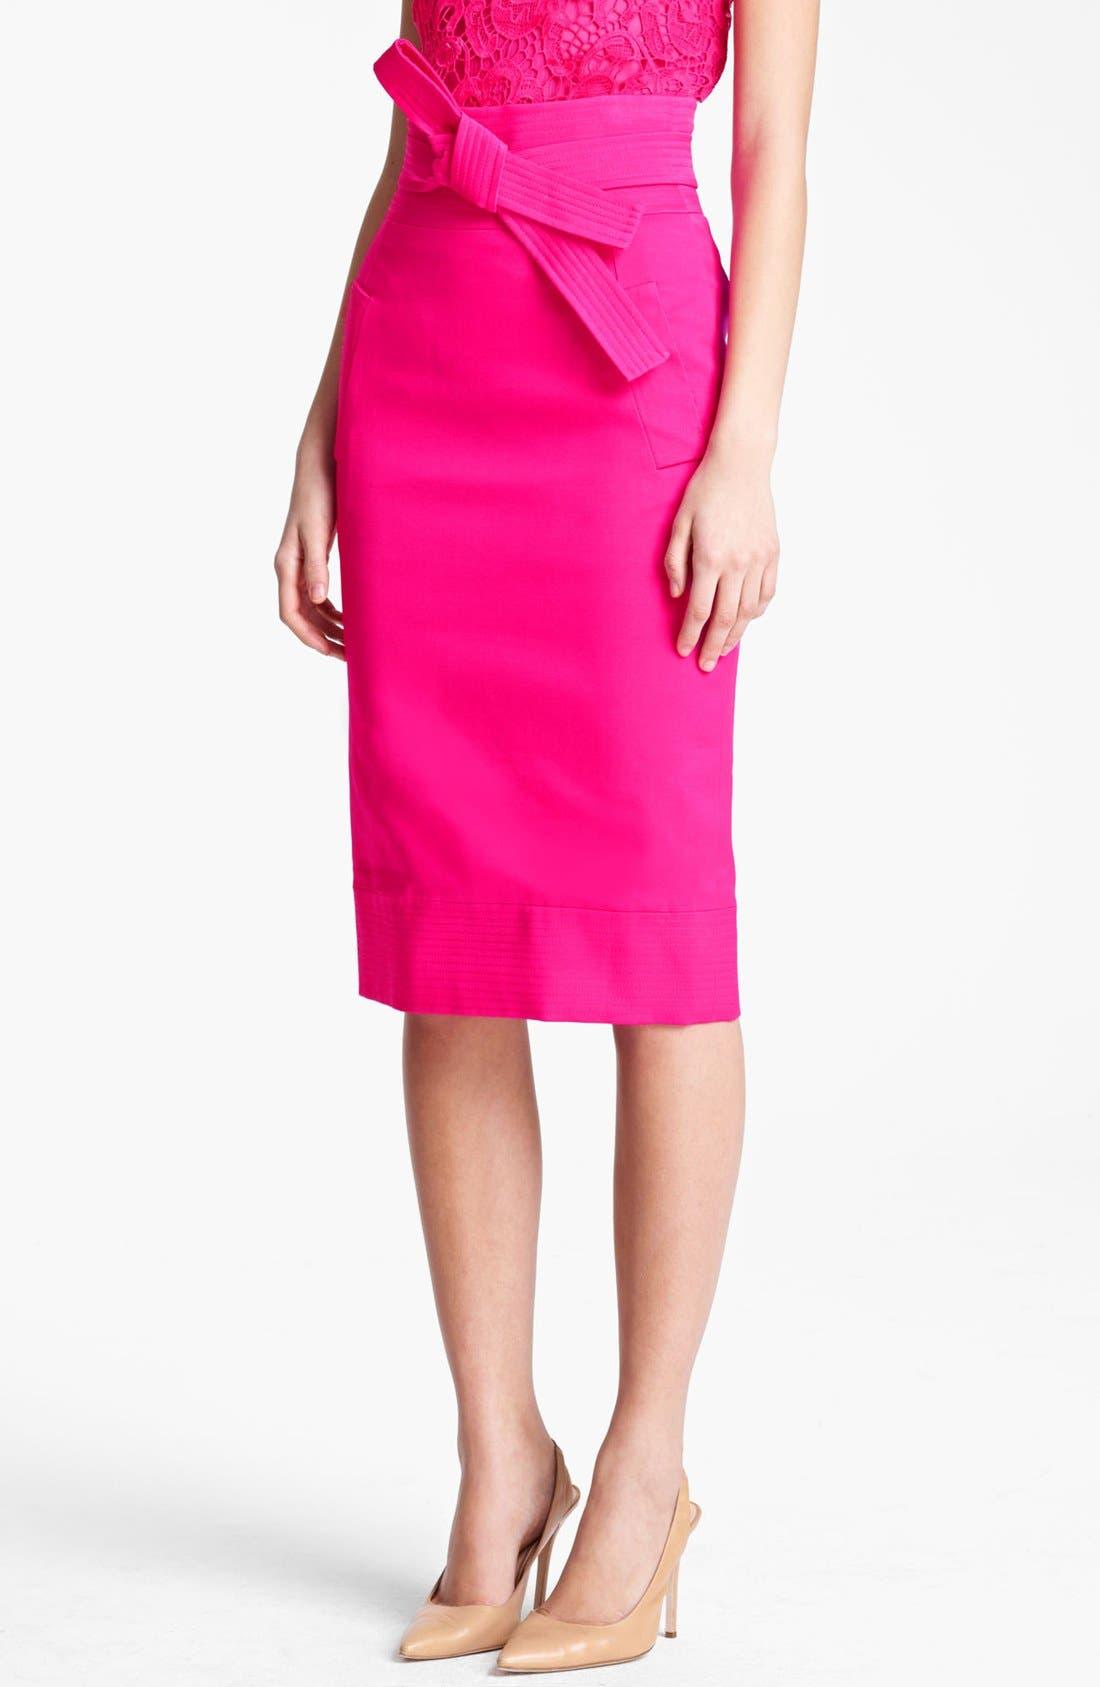 Alternate Image 1 Selected - Oscar de la Renta High Waist Tie Front Skirt